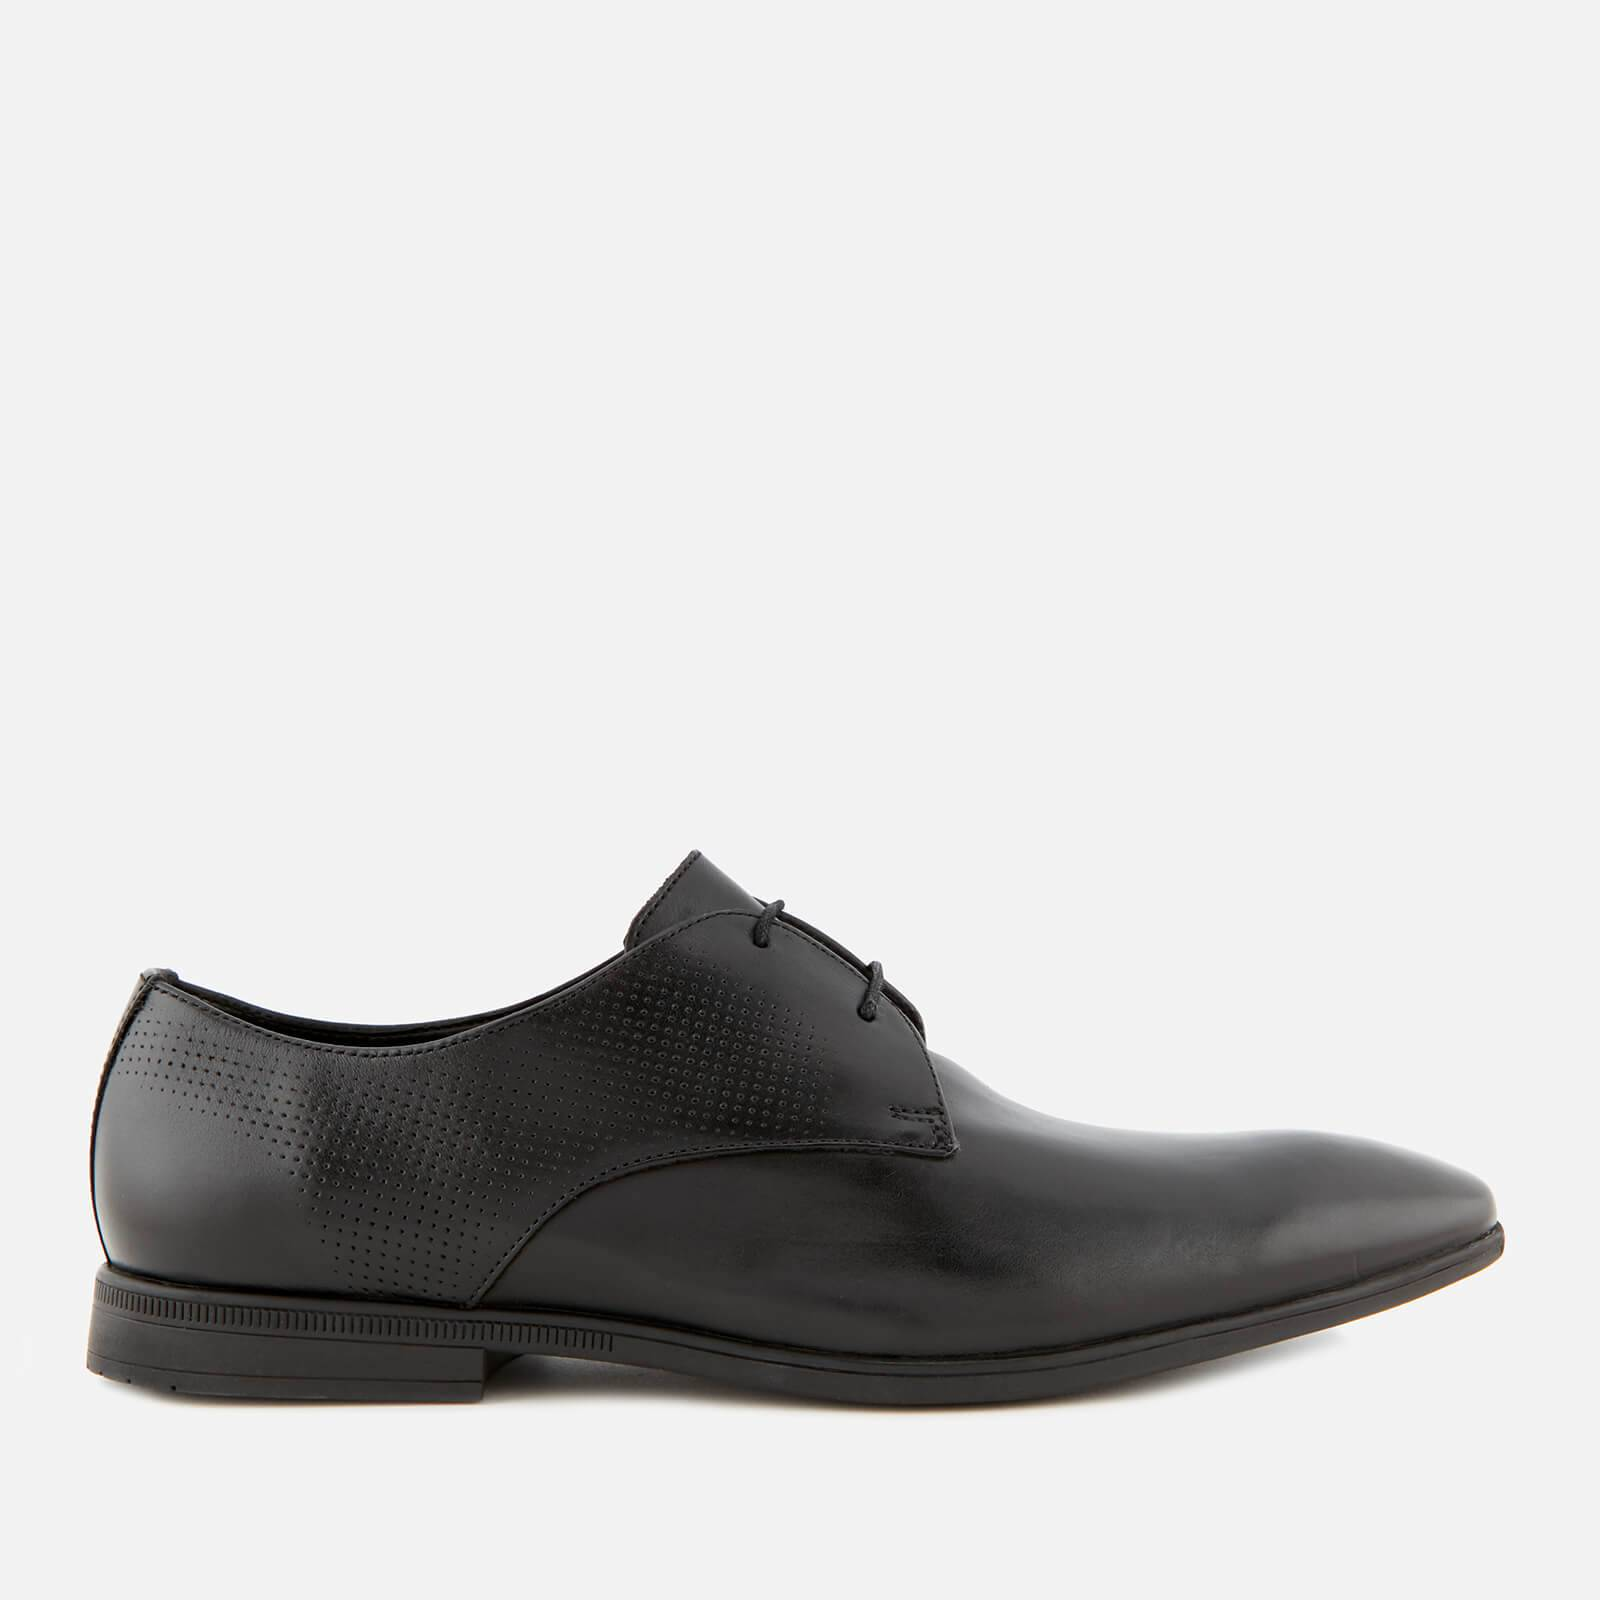 Clarks Men's Bampton Walk Leather Derby Shoes - Black - UK 8 - Black